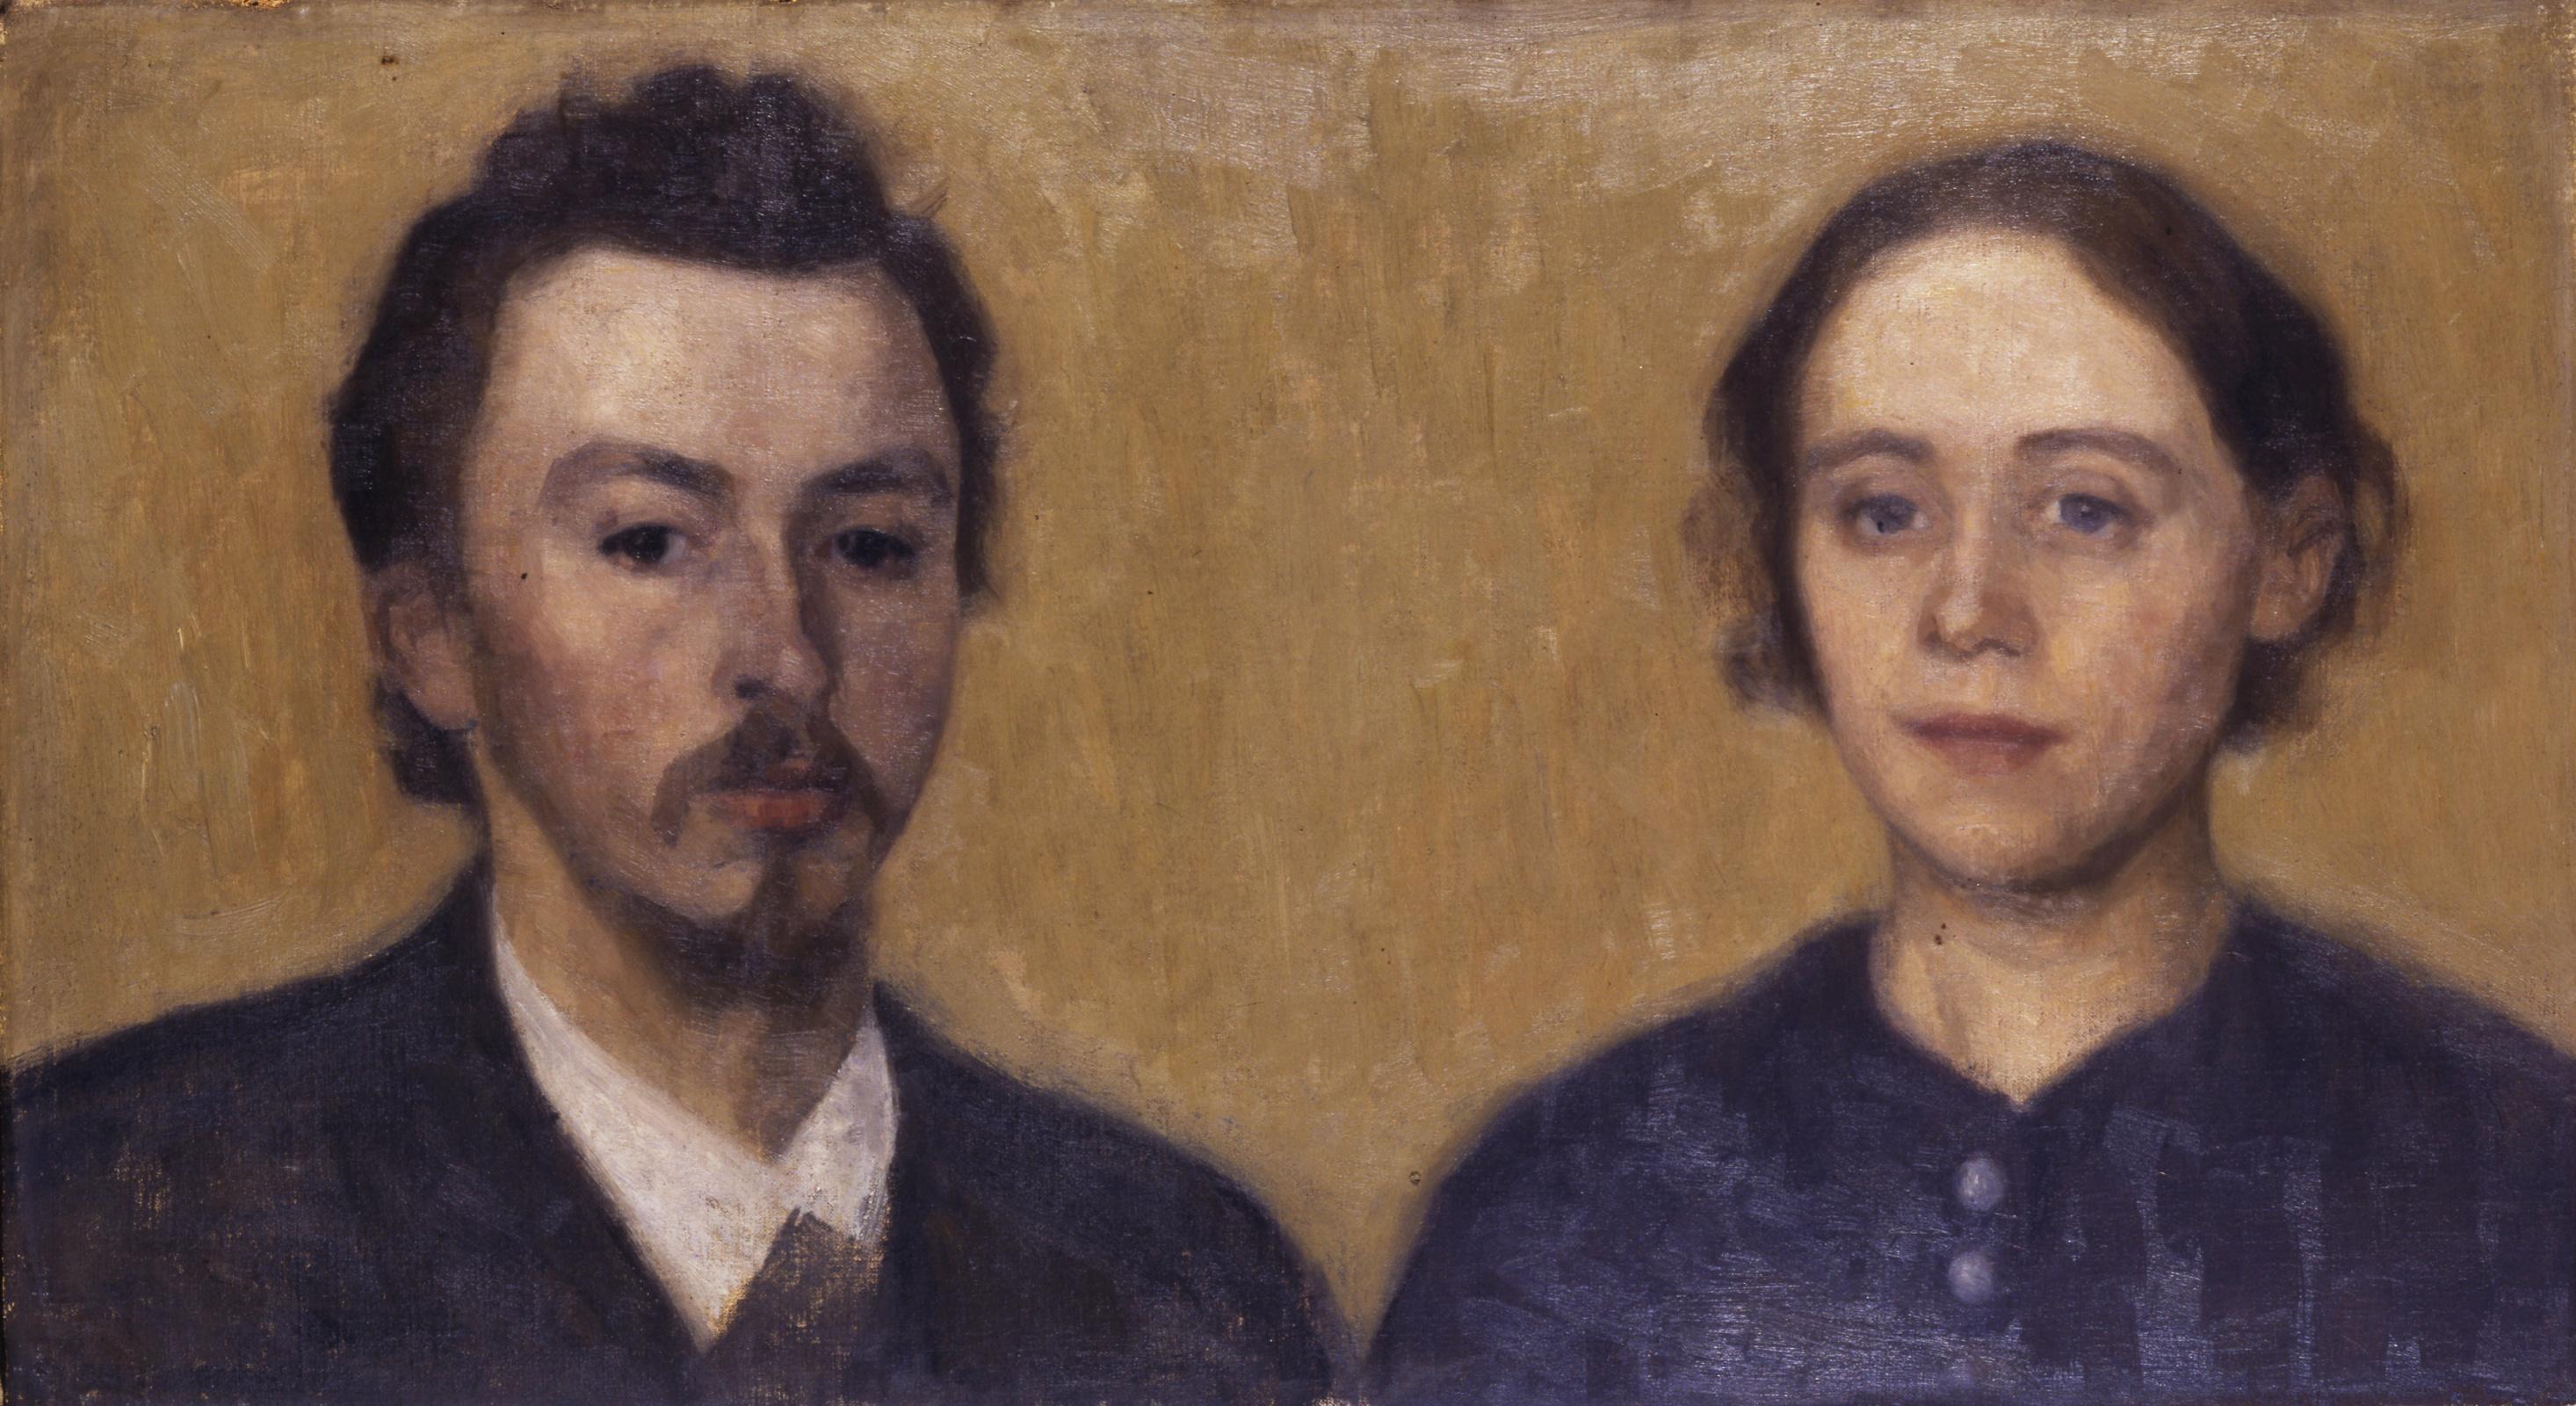 「Vilhelm Hammershøi wife」の画像検索結果